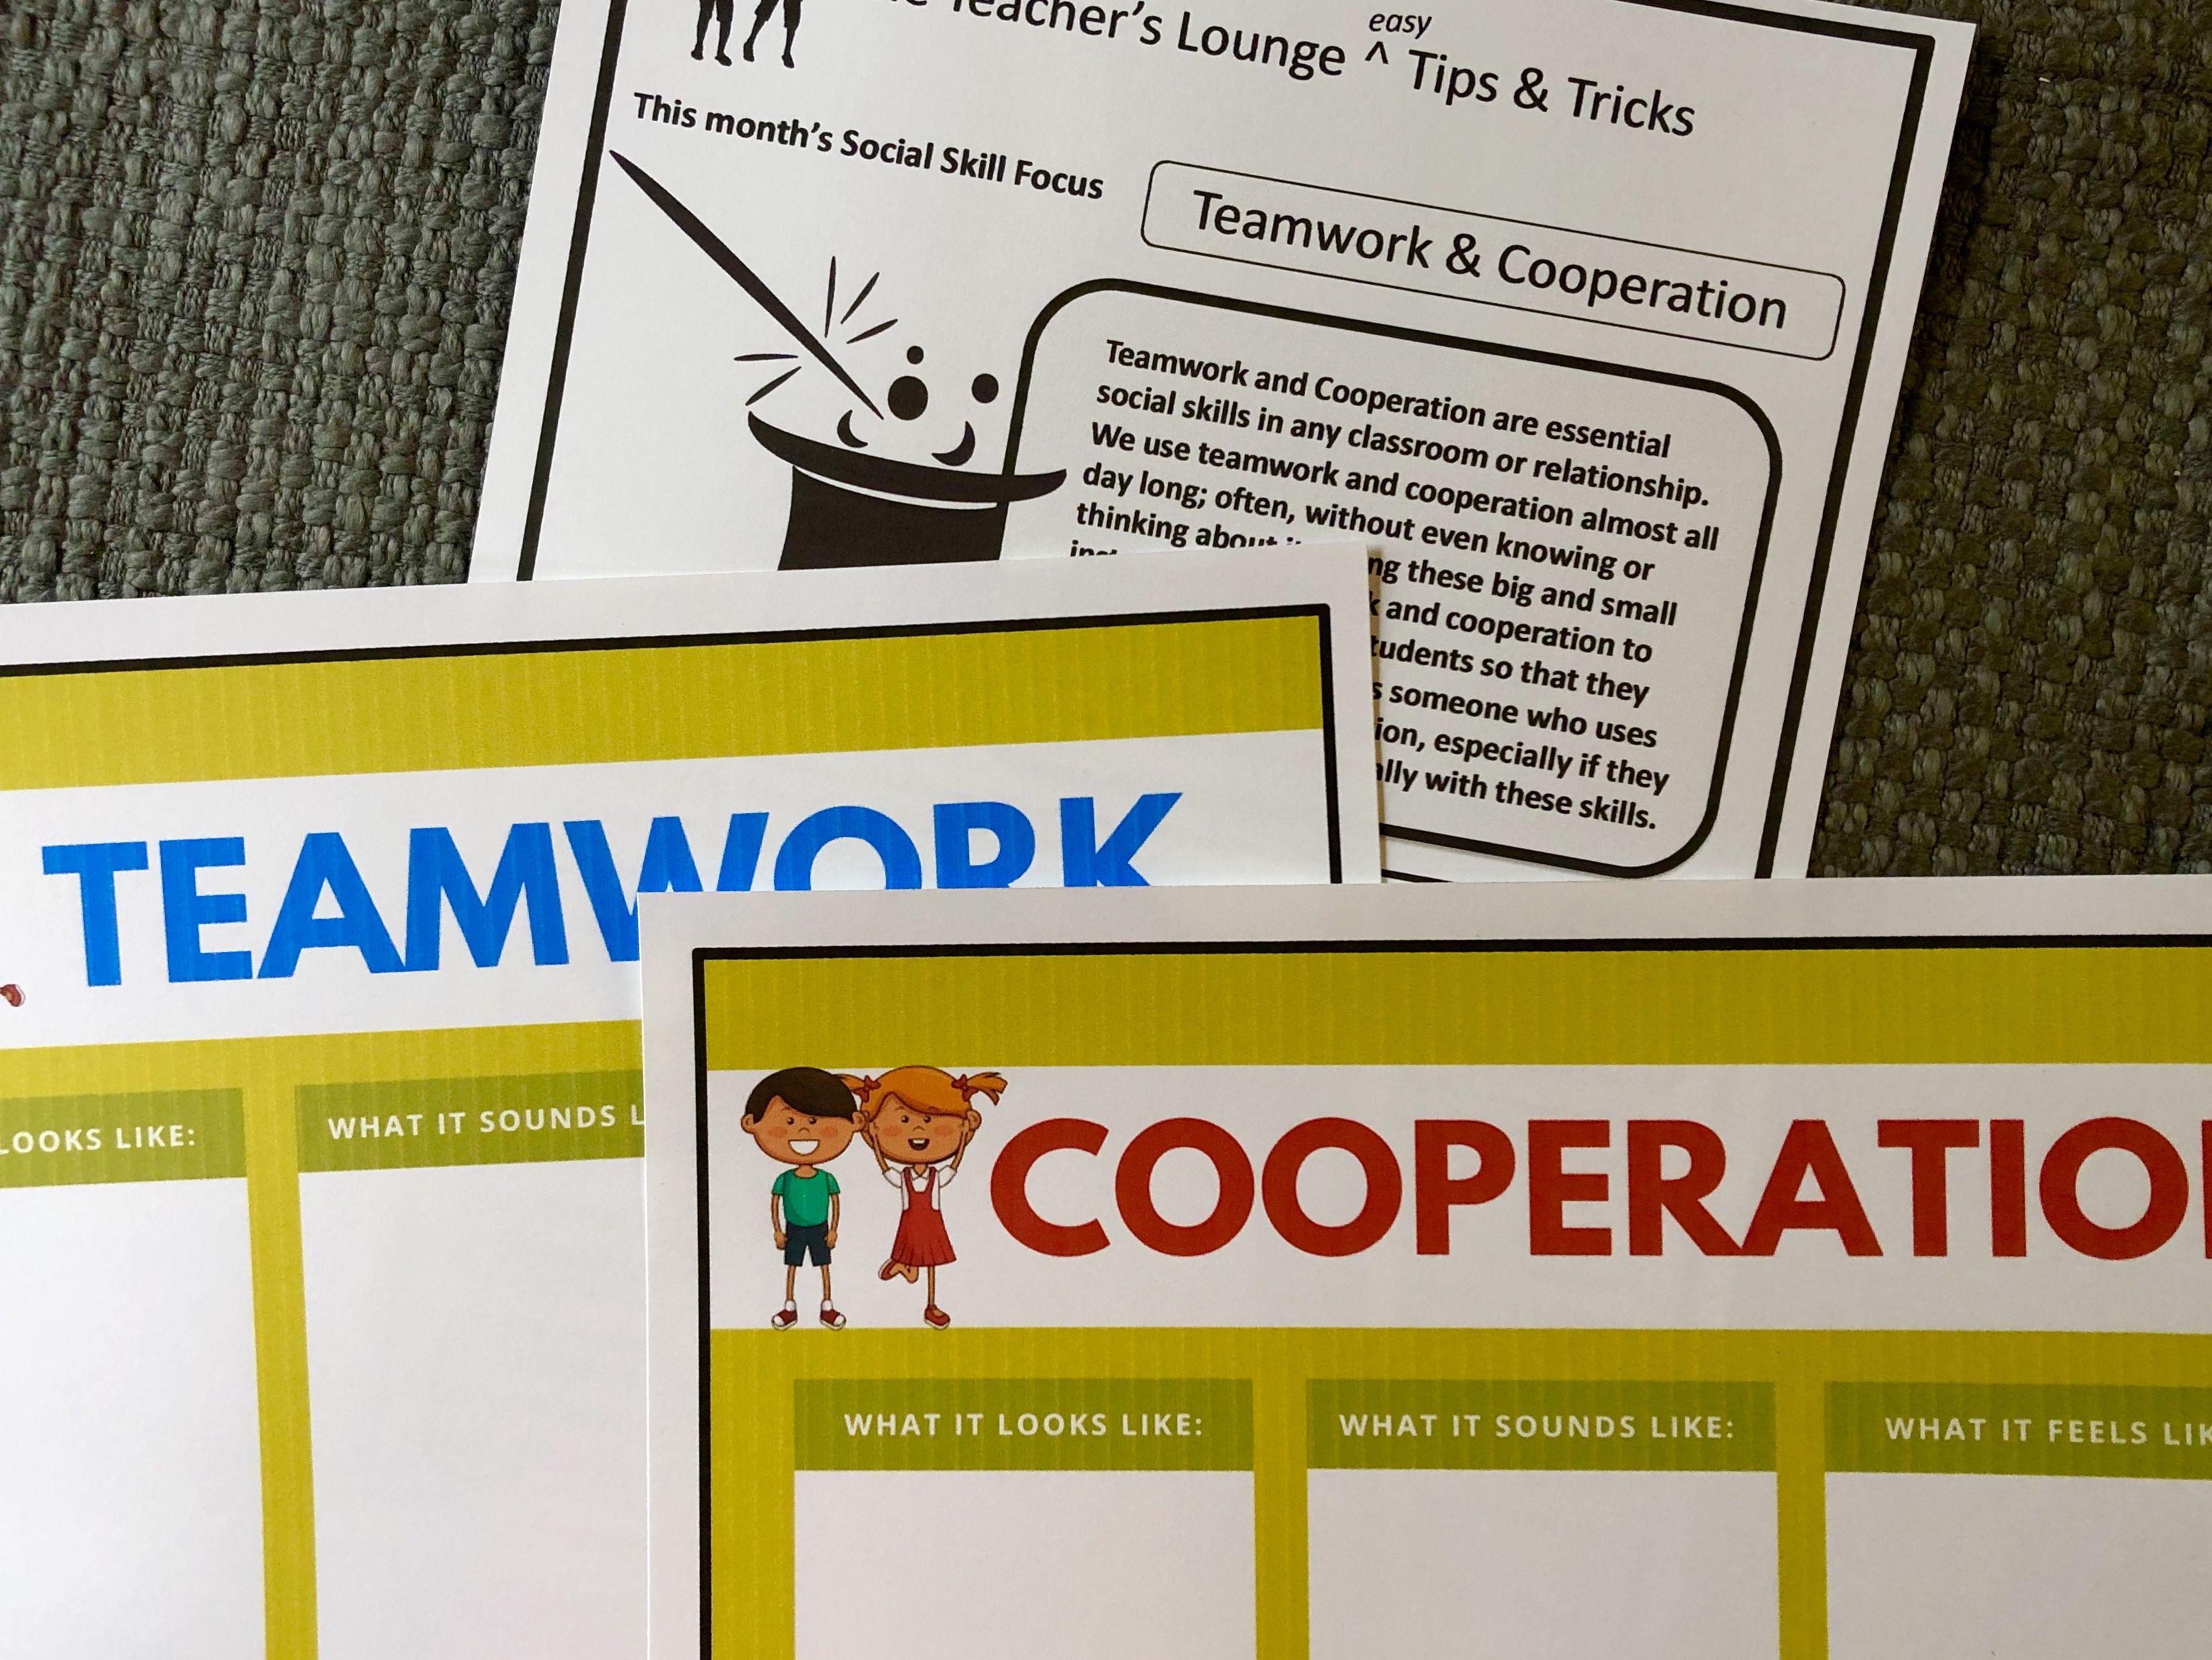 Teach Teamwork And Cooperation